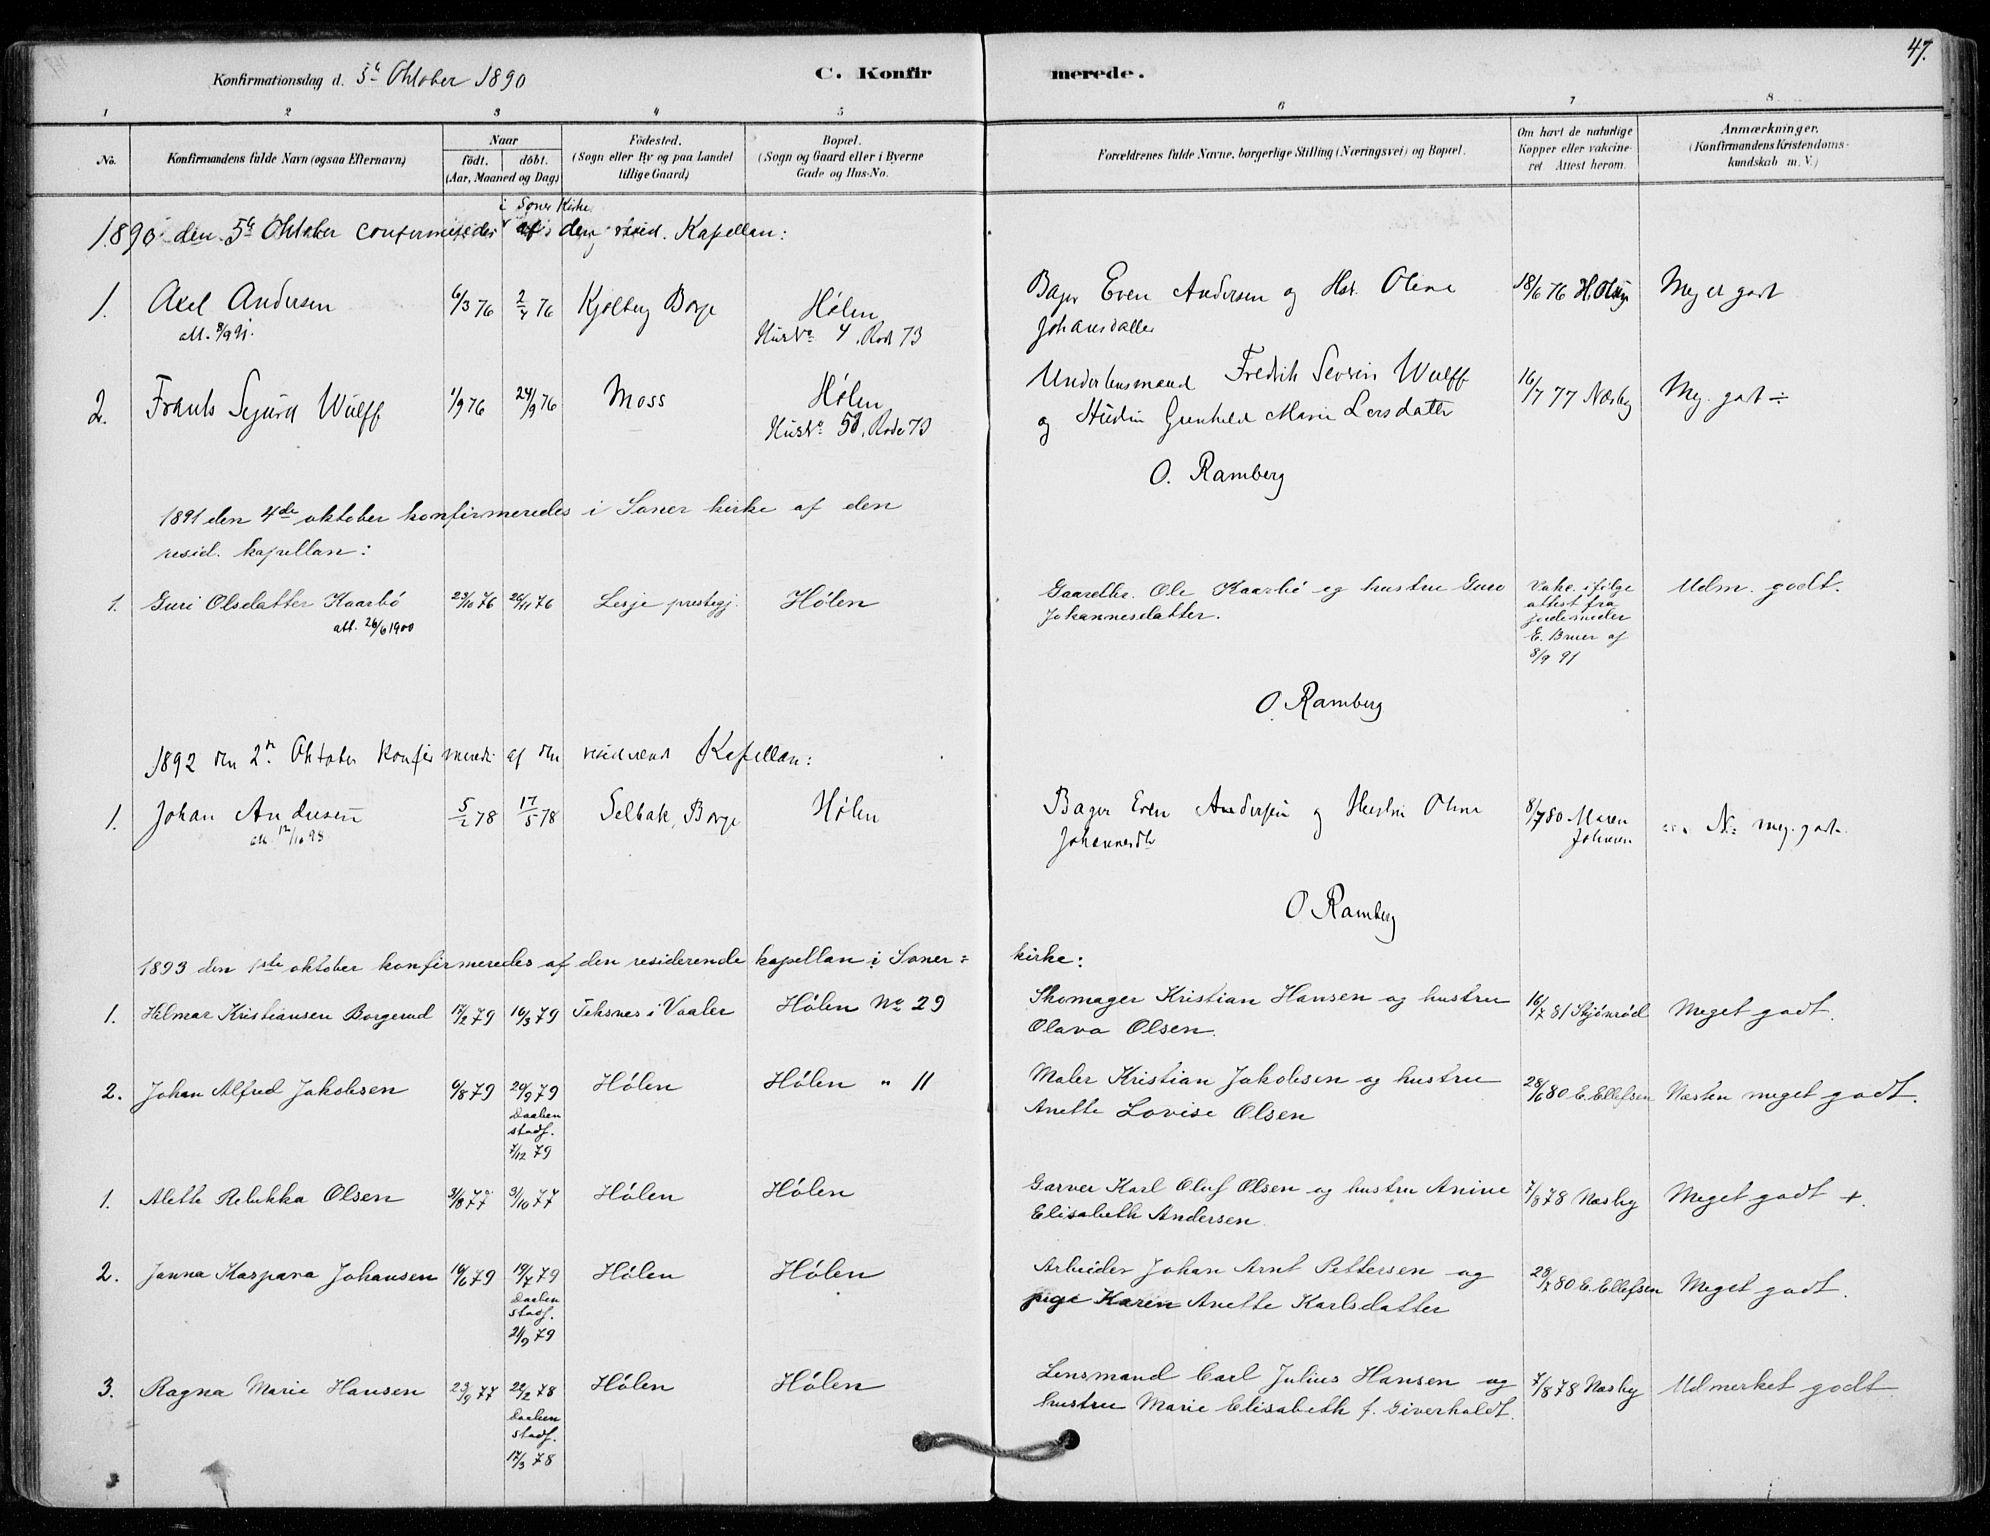 SAO, Vestby prestekontor Kirkebøker, F/Fe/L0001: Ministerialbok nr. V 1, 1878-1931, s. 47